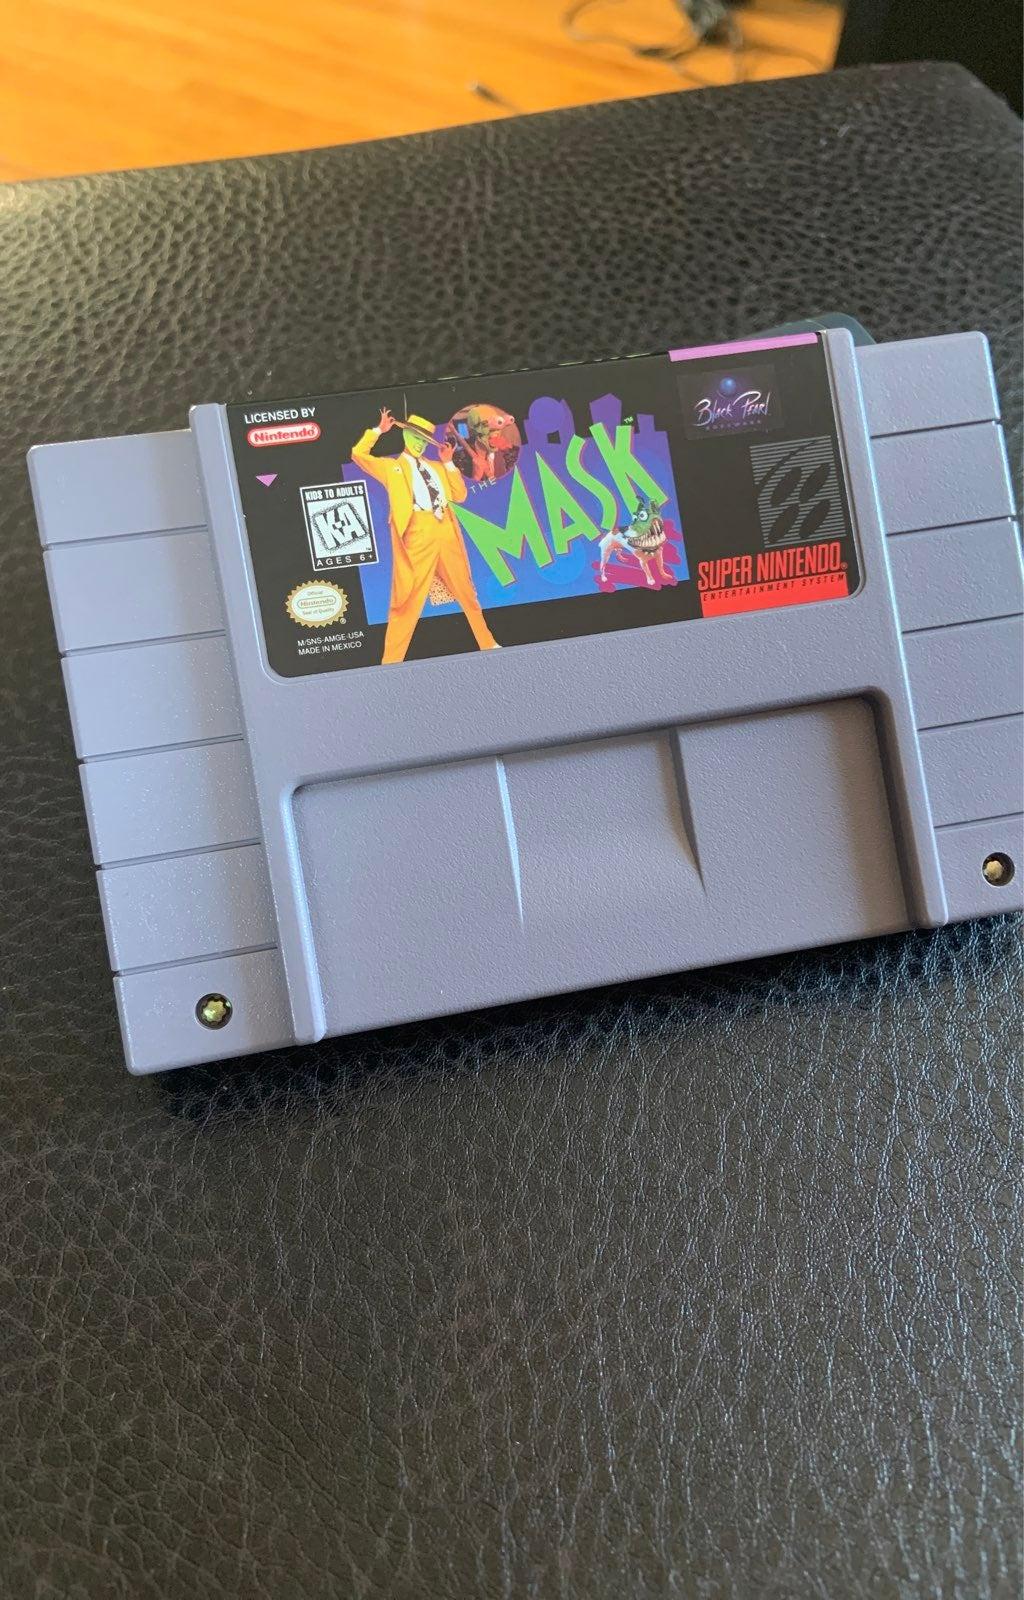 The Mask on Nintendo Super NES